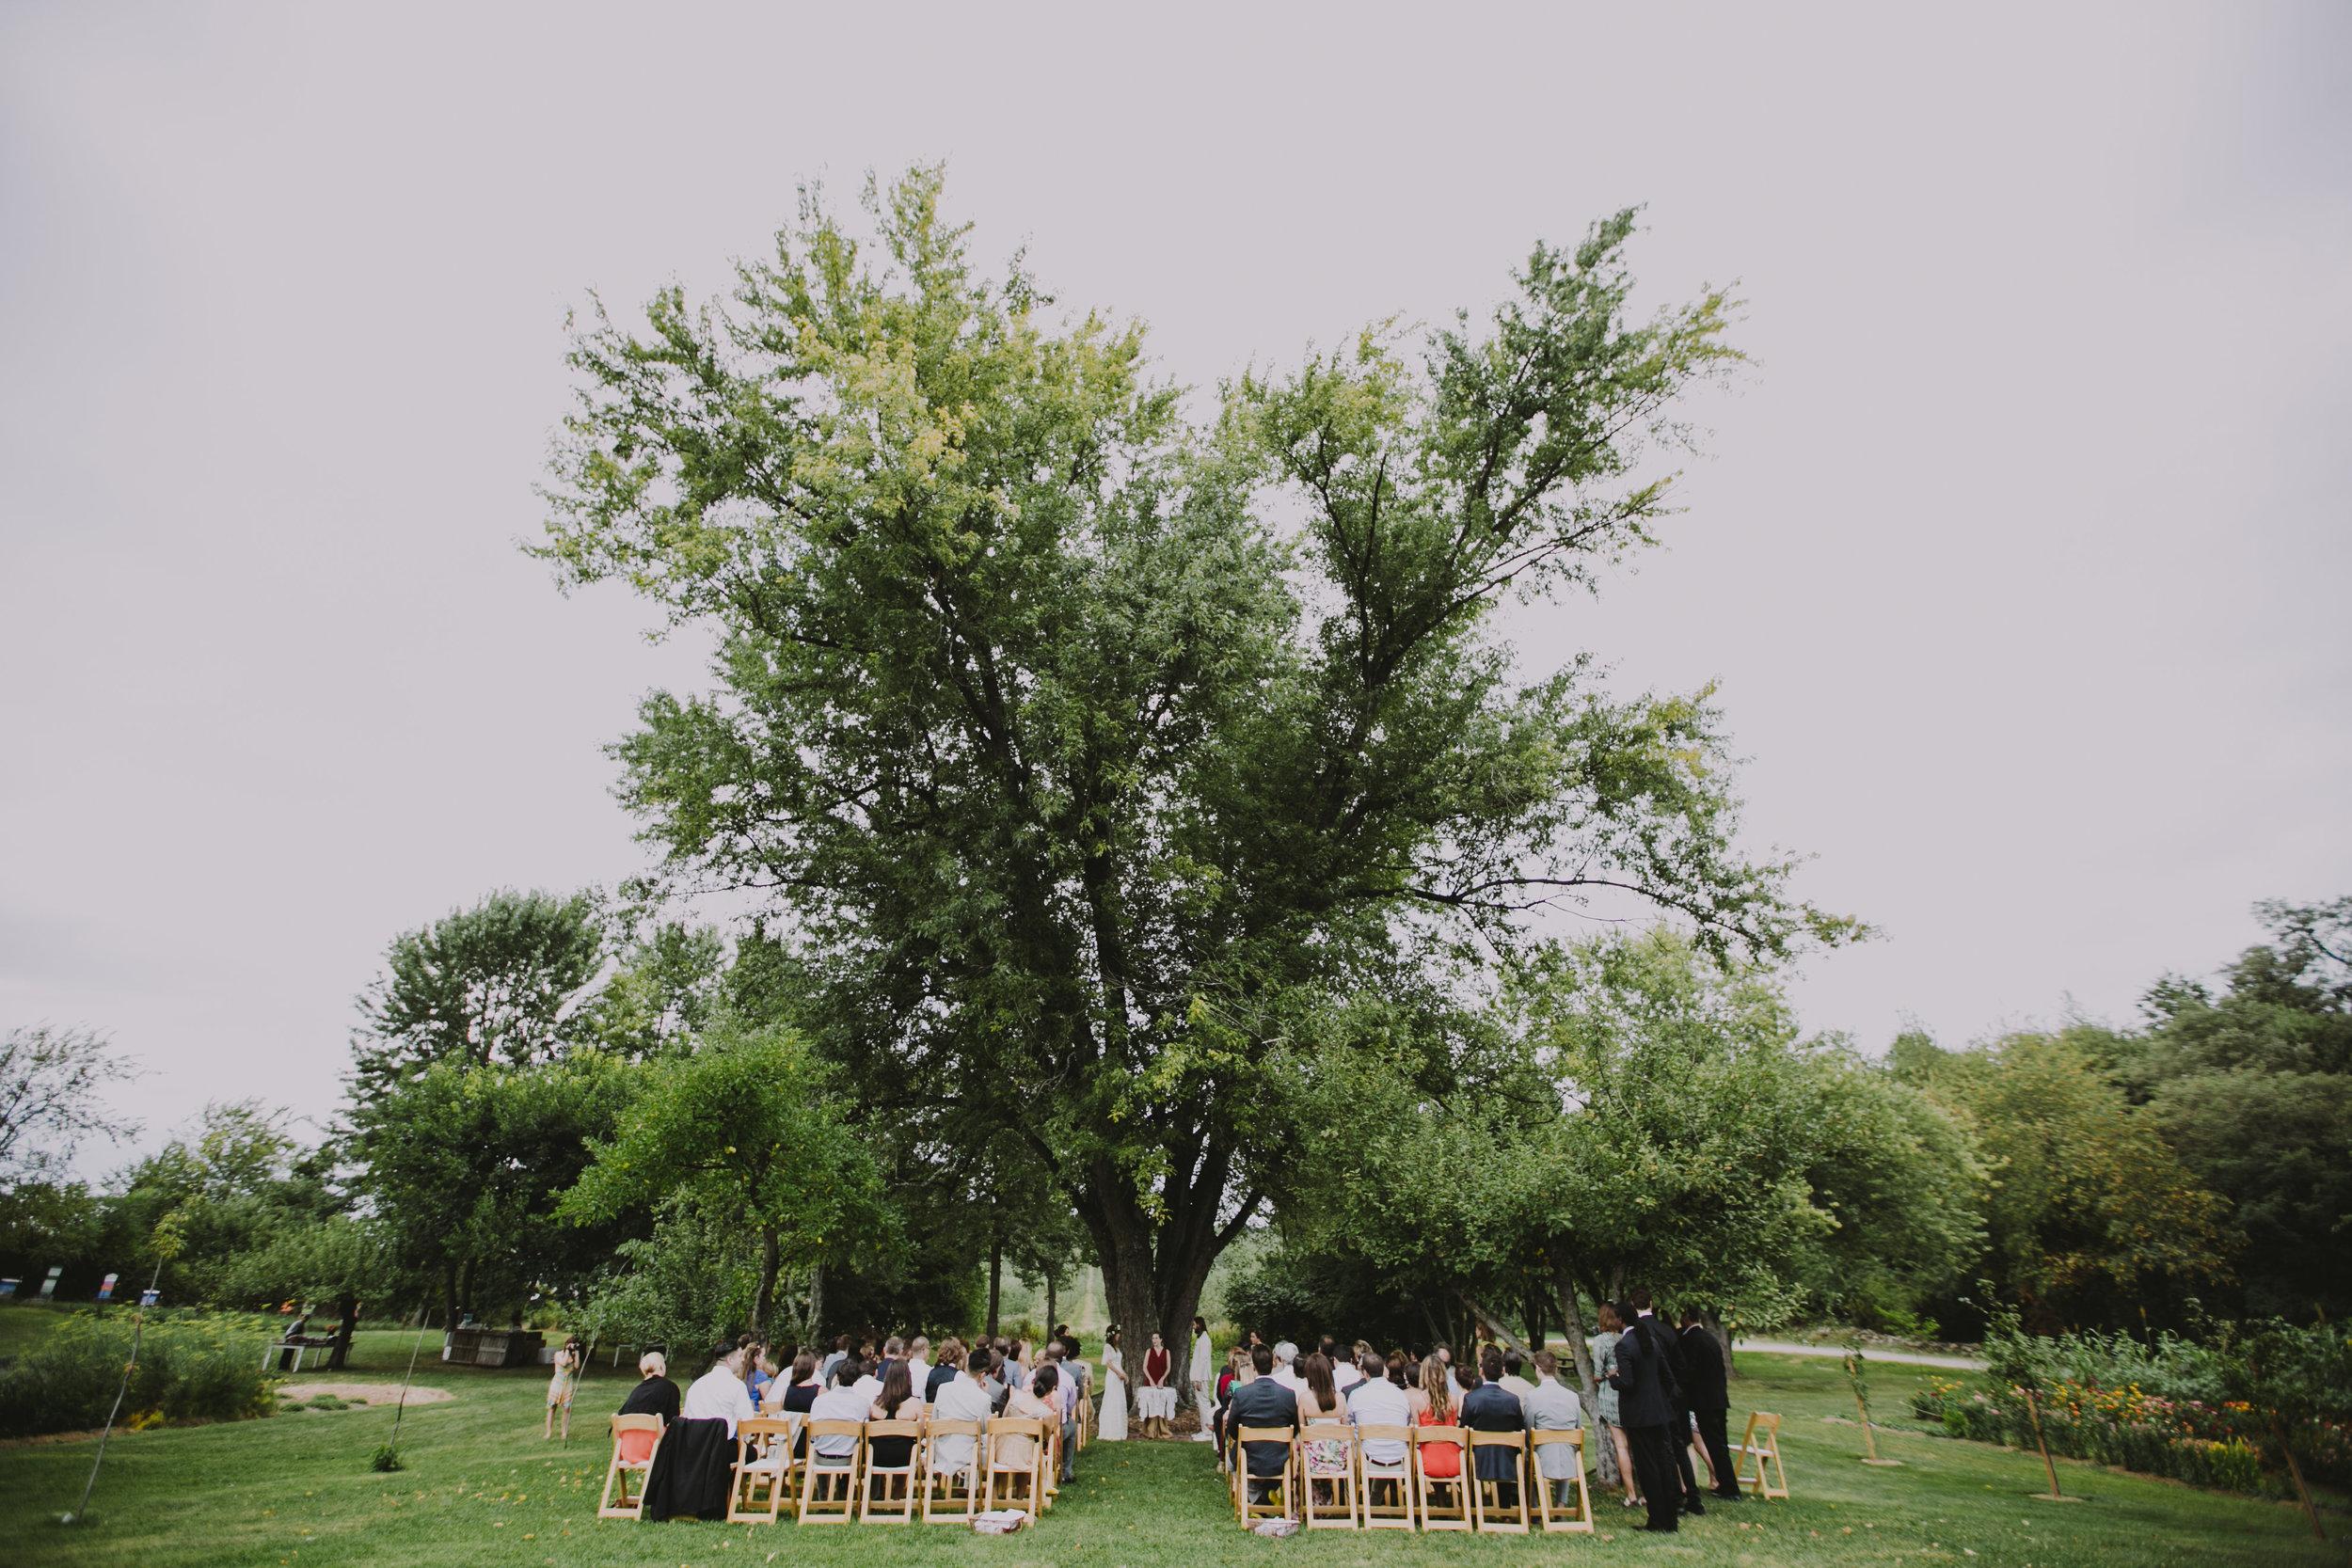 LIBERTY_VIEW_FARM_HIGHLAND_NY_WEDDING_CHELLISE_MICHAEL_PHOTOGRAPHY830.JPG